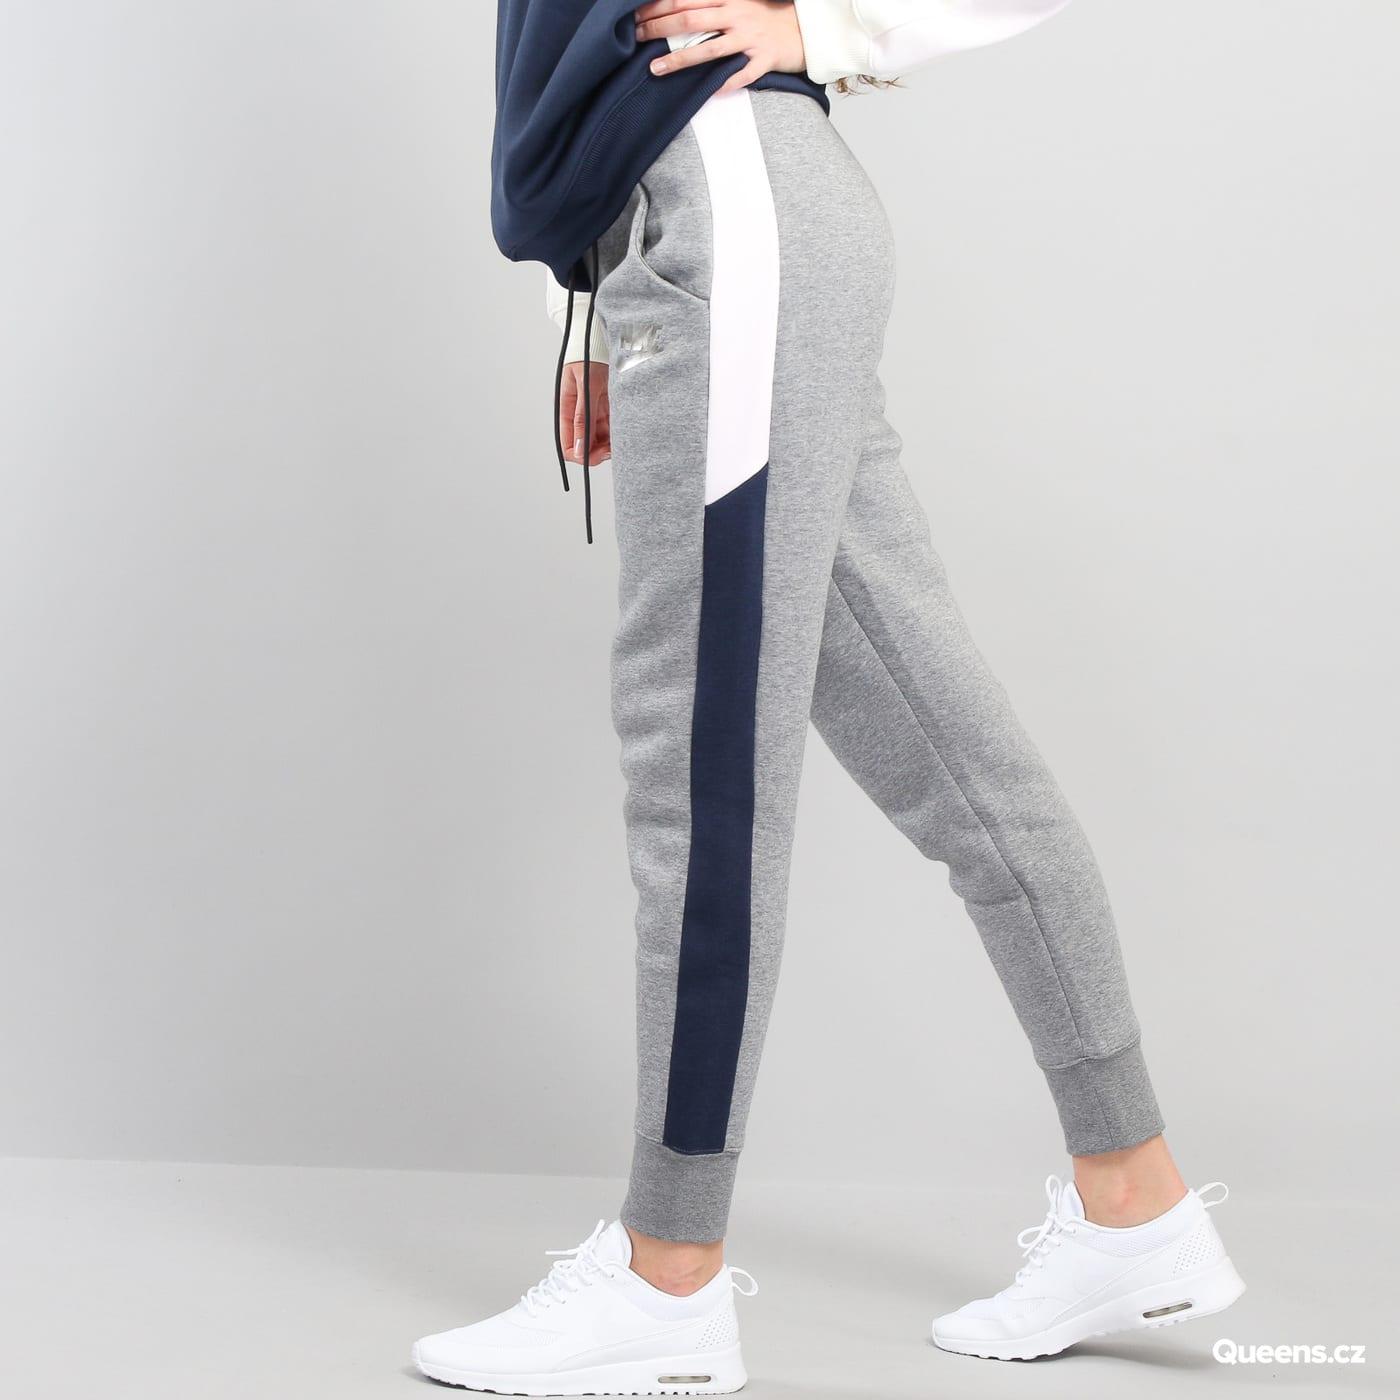 pantaloni tuta nike domna